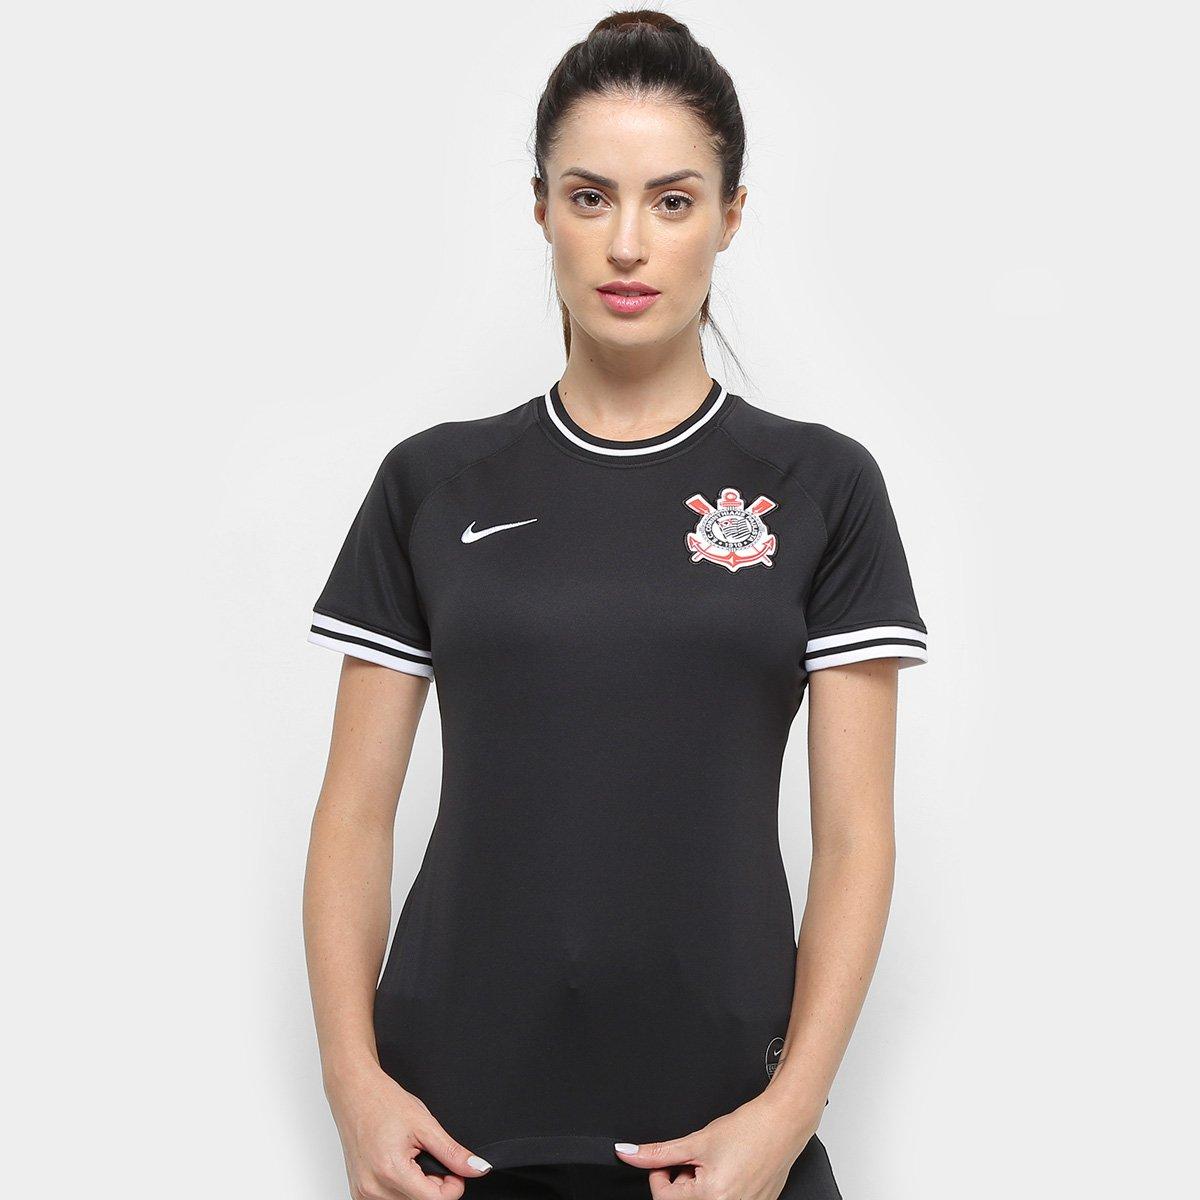 latín techo nacido  Camisa Corinthians II 19/20 s/nº Torcedor Nike Feminina | Shop Timão